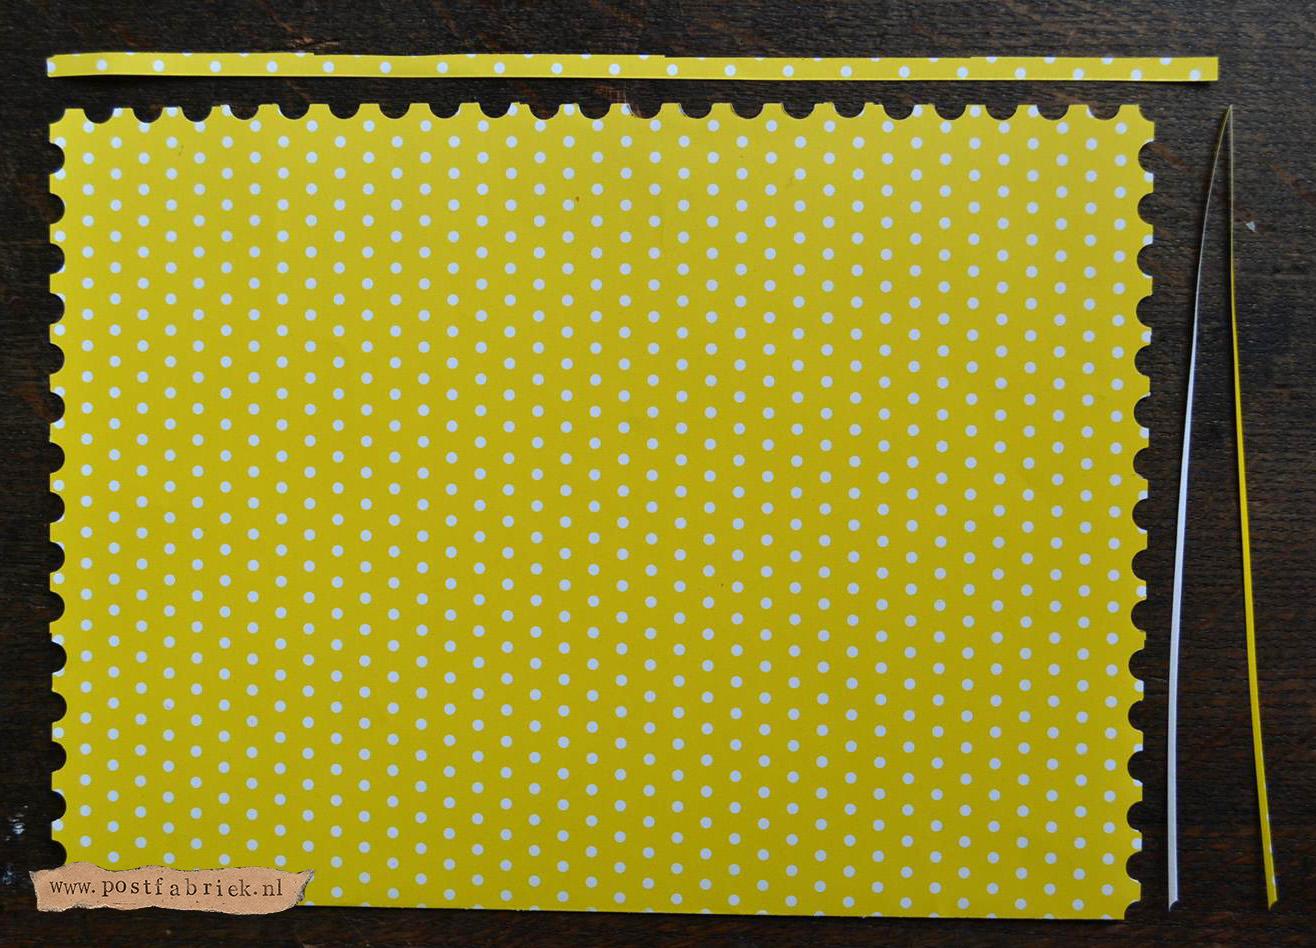 Postzegelrand 15